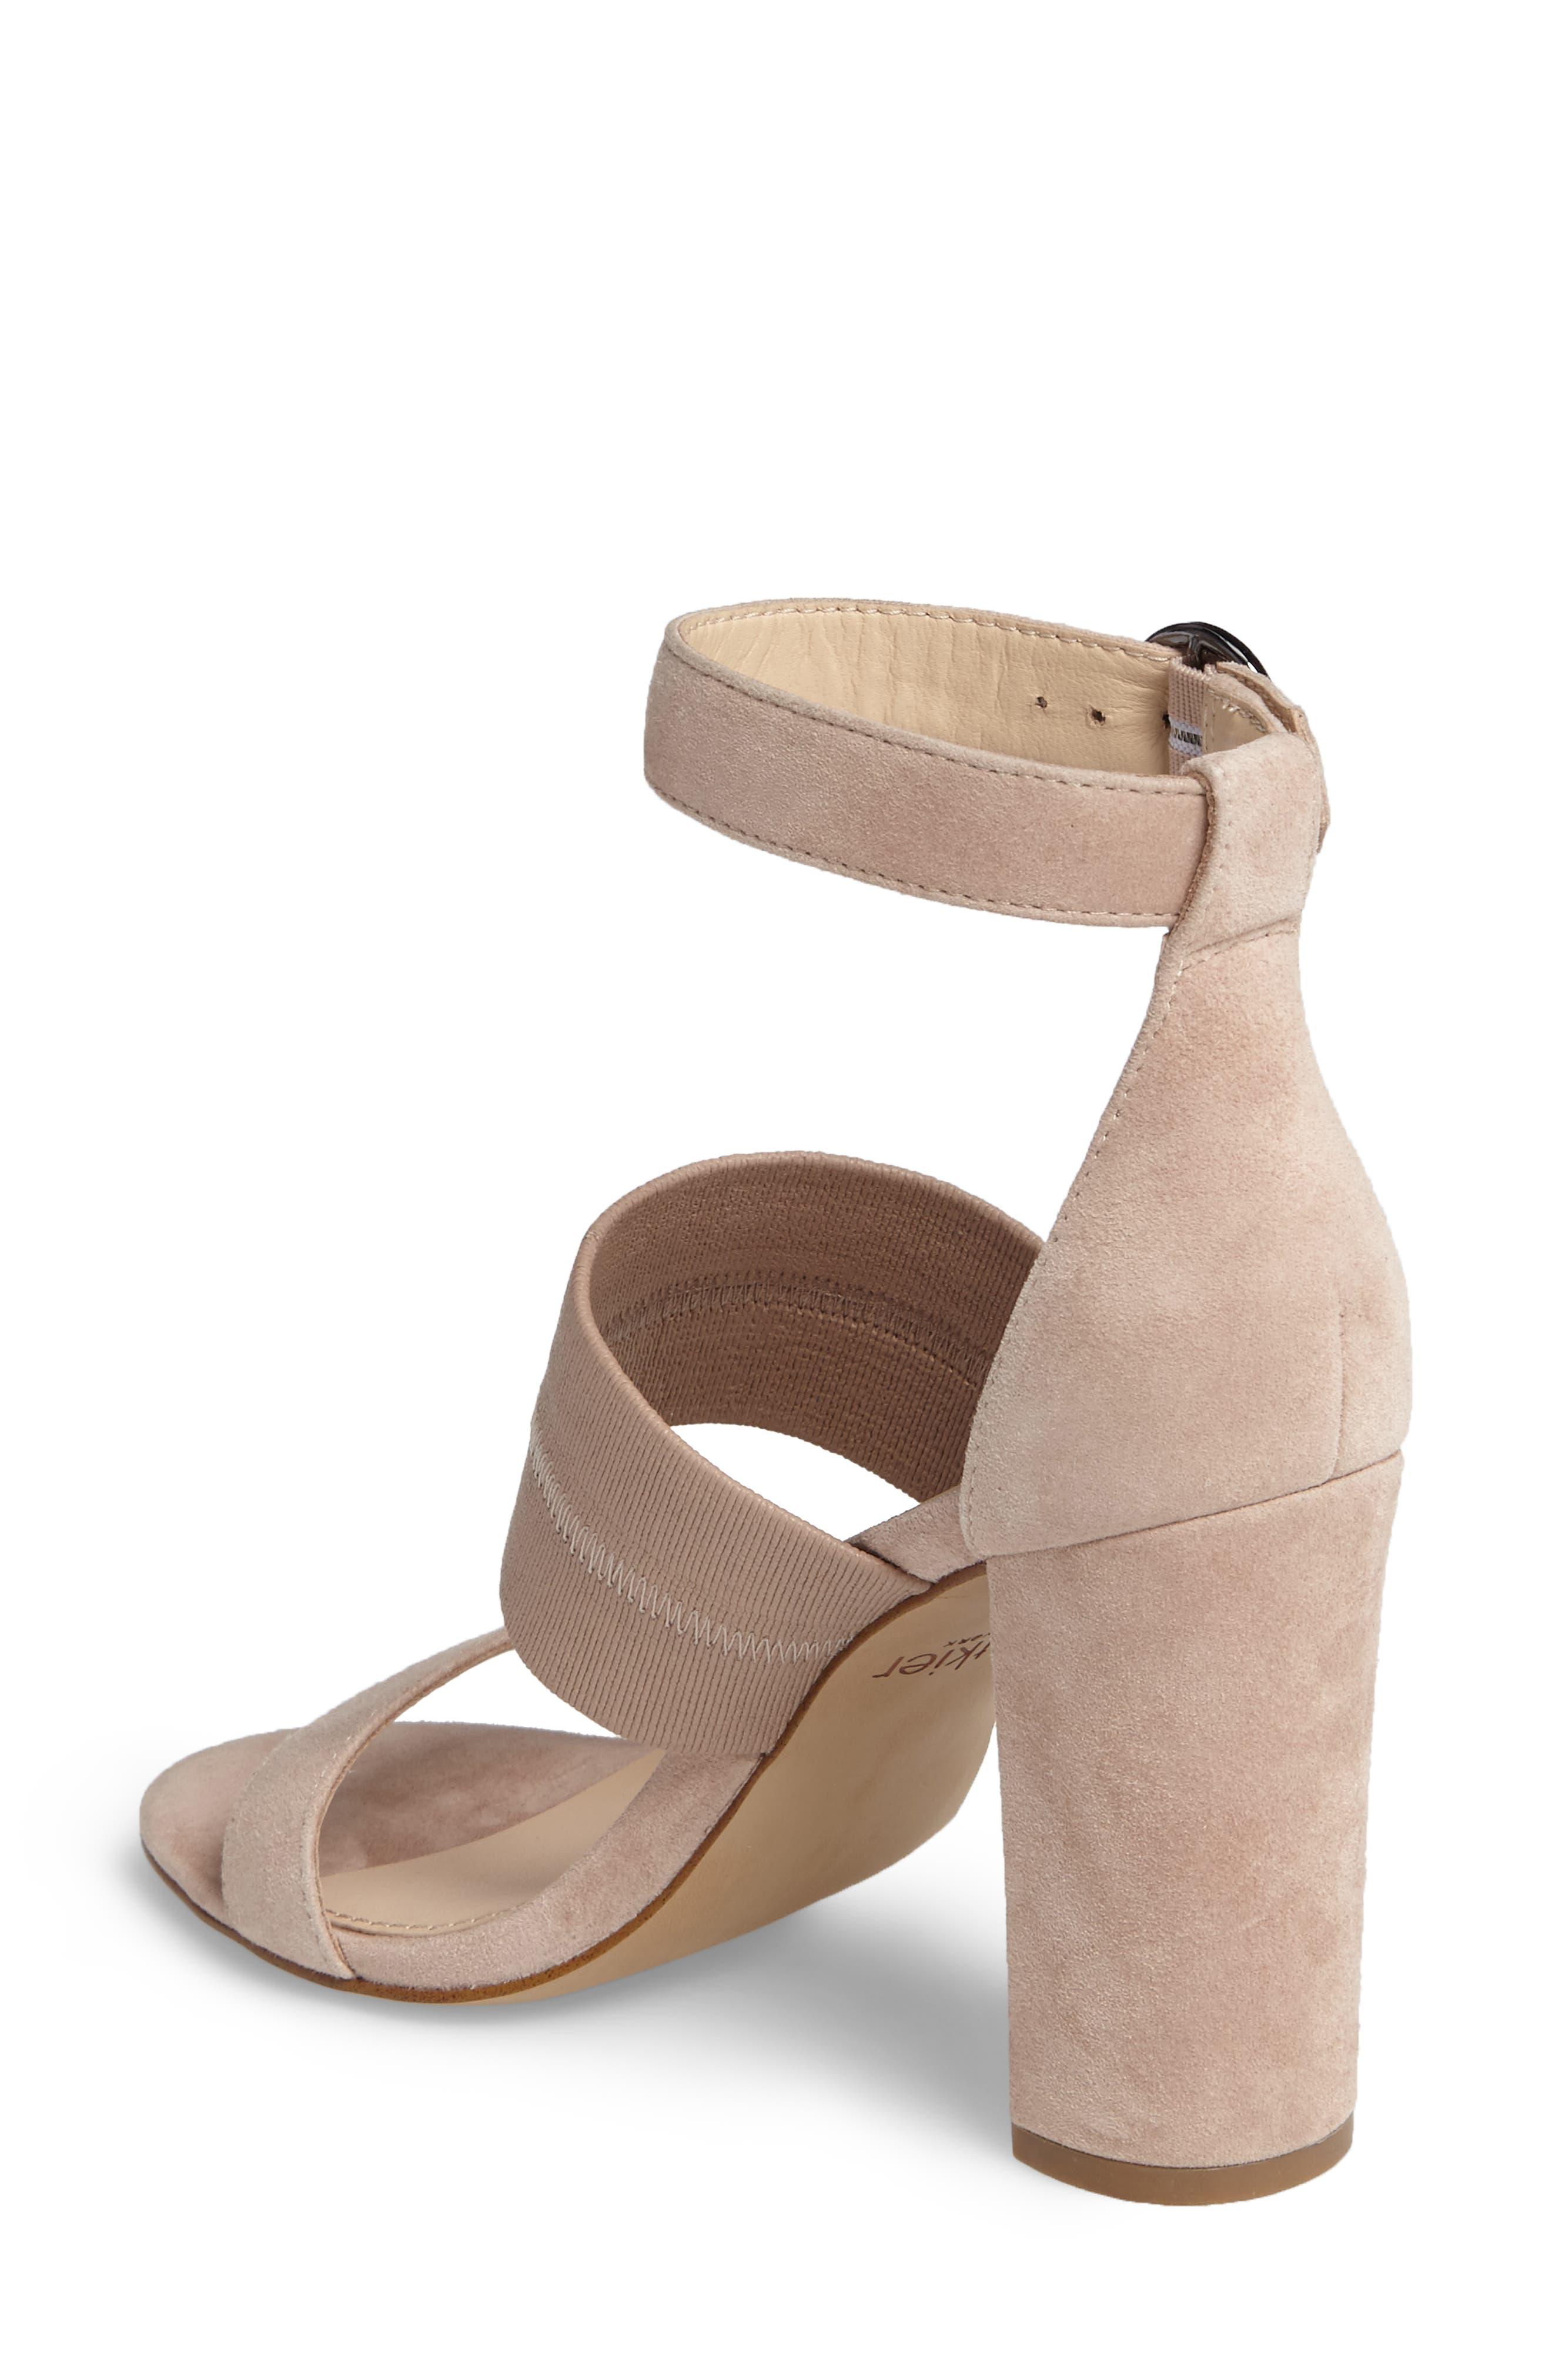 Gisella Ankle Strap Sandal,                             Alternate thumbnail 4, color,